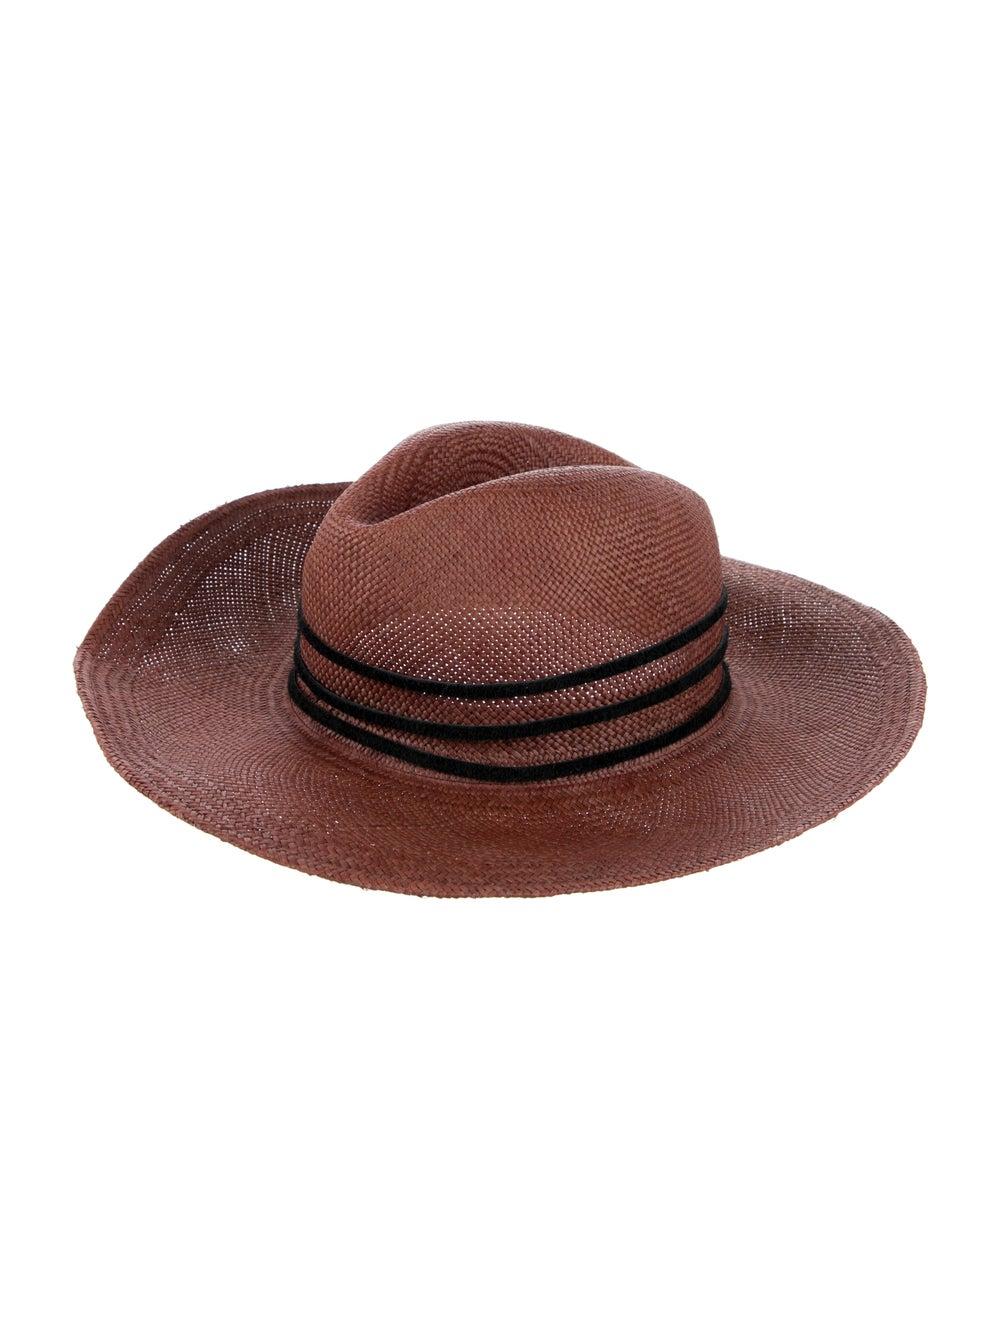 Janessa Leone Straw Fedora Hat red - image 1